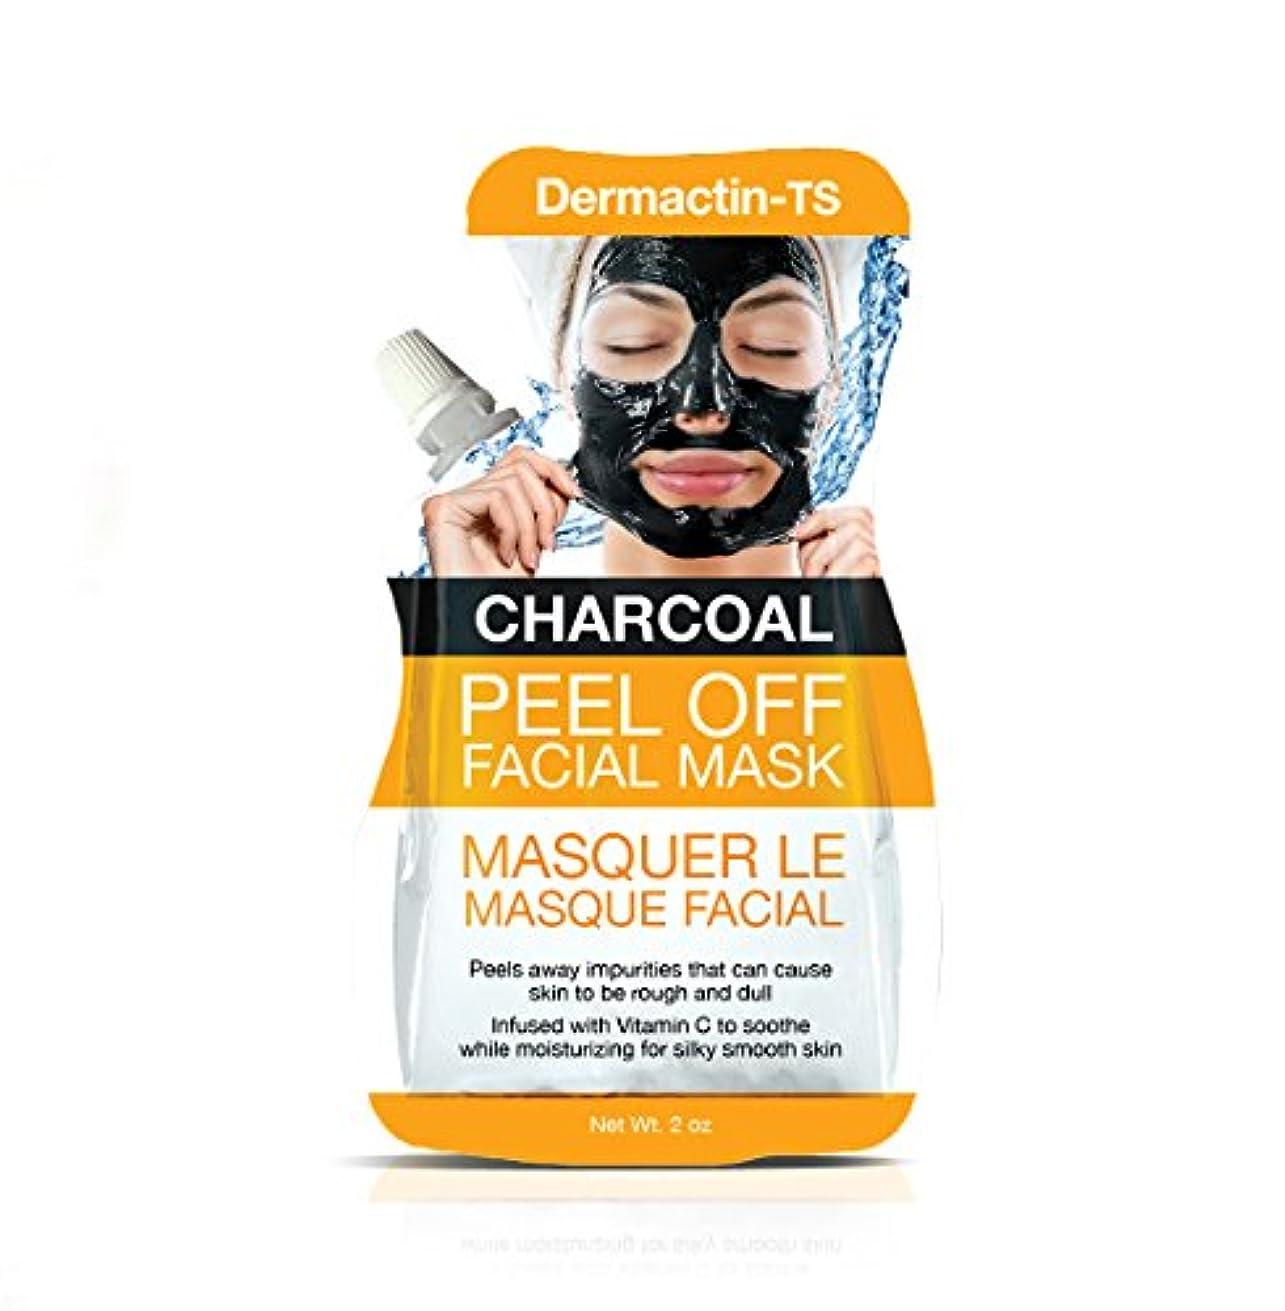 Dermactin-TS フェイシャル?マスク?チャコール50g(パック6枚) (並行輸入品)